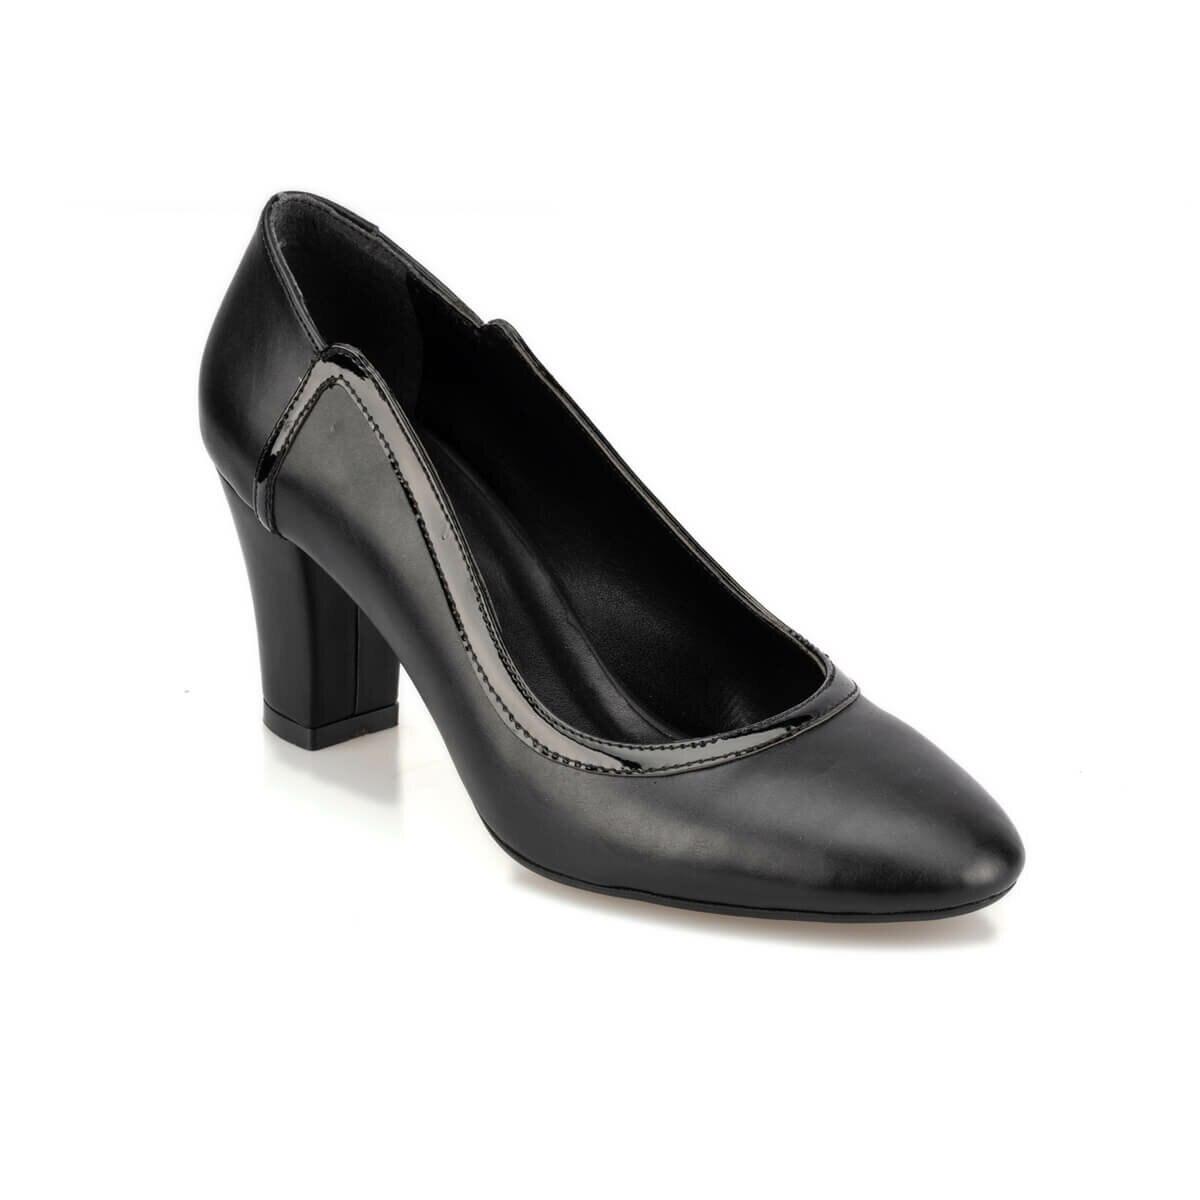 FLO 92.314125.Z Black Women Gova Shoes Polaris